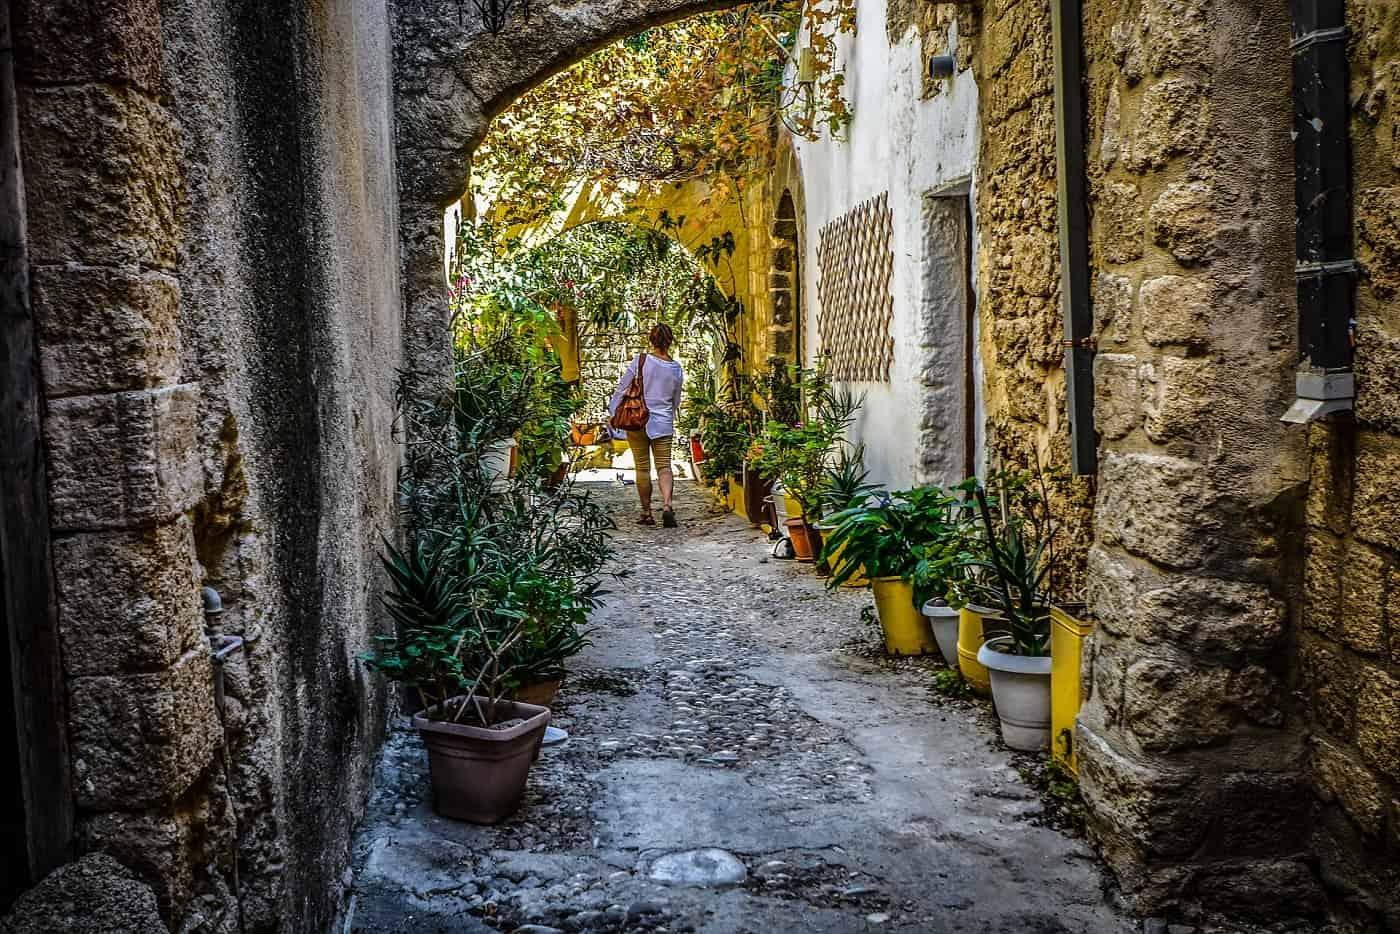 Woman walking alone on cobblestone path - The solo traveler's handbook